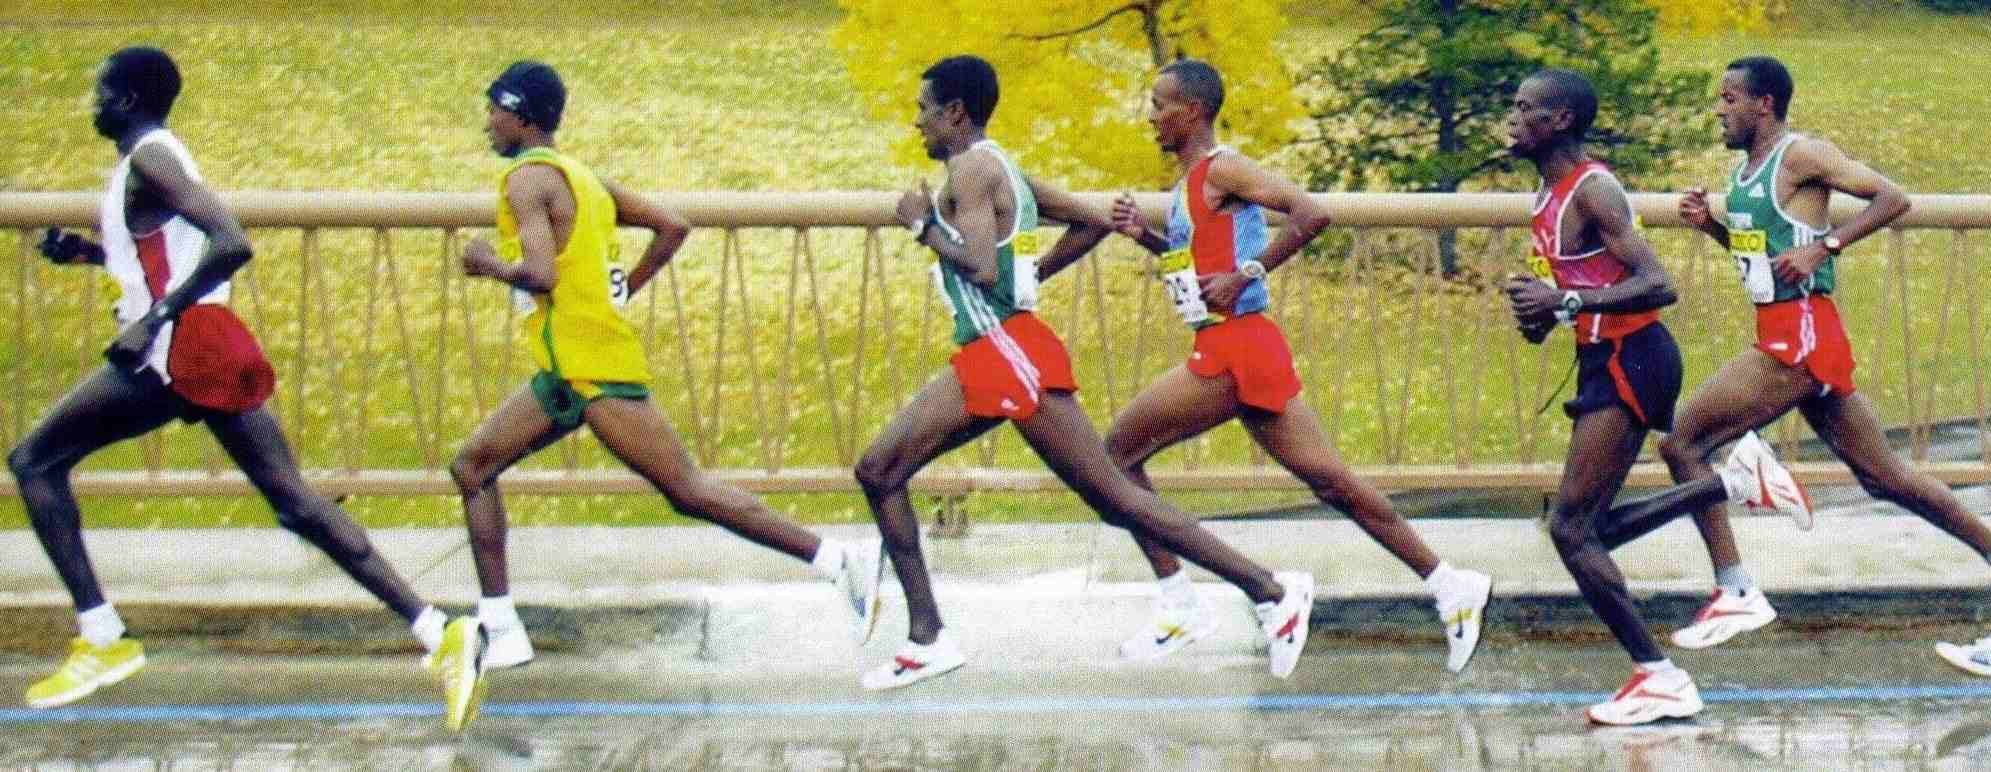 kenyan-runners-02.jpg